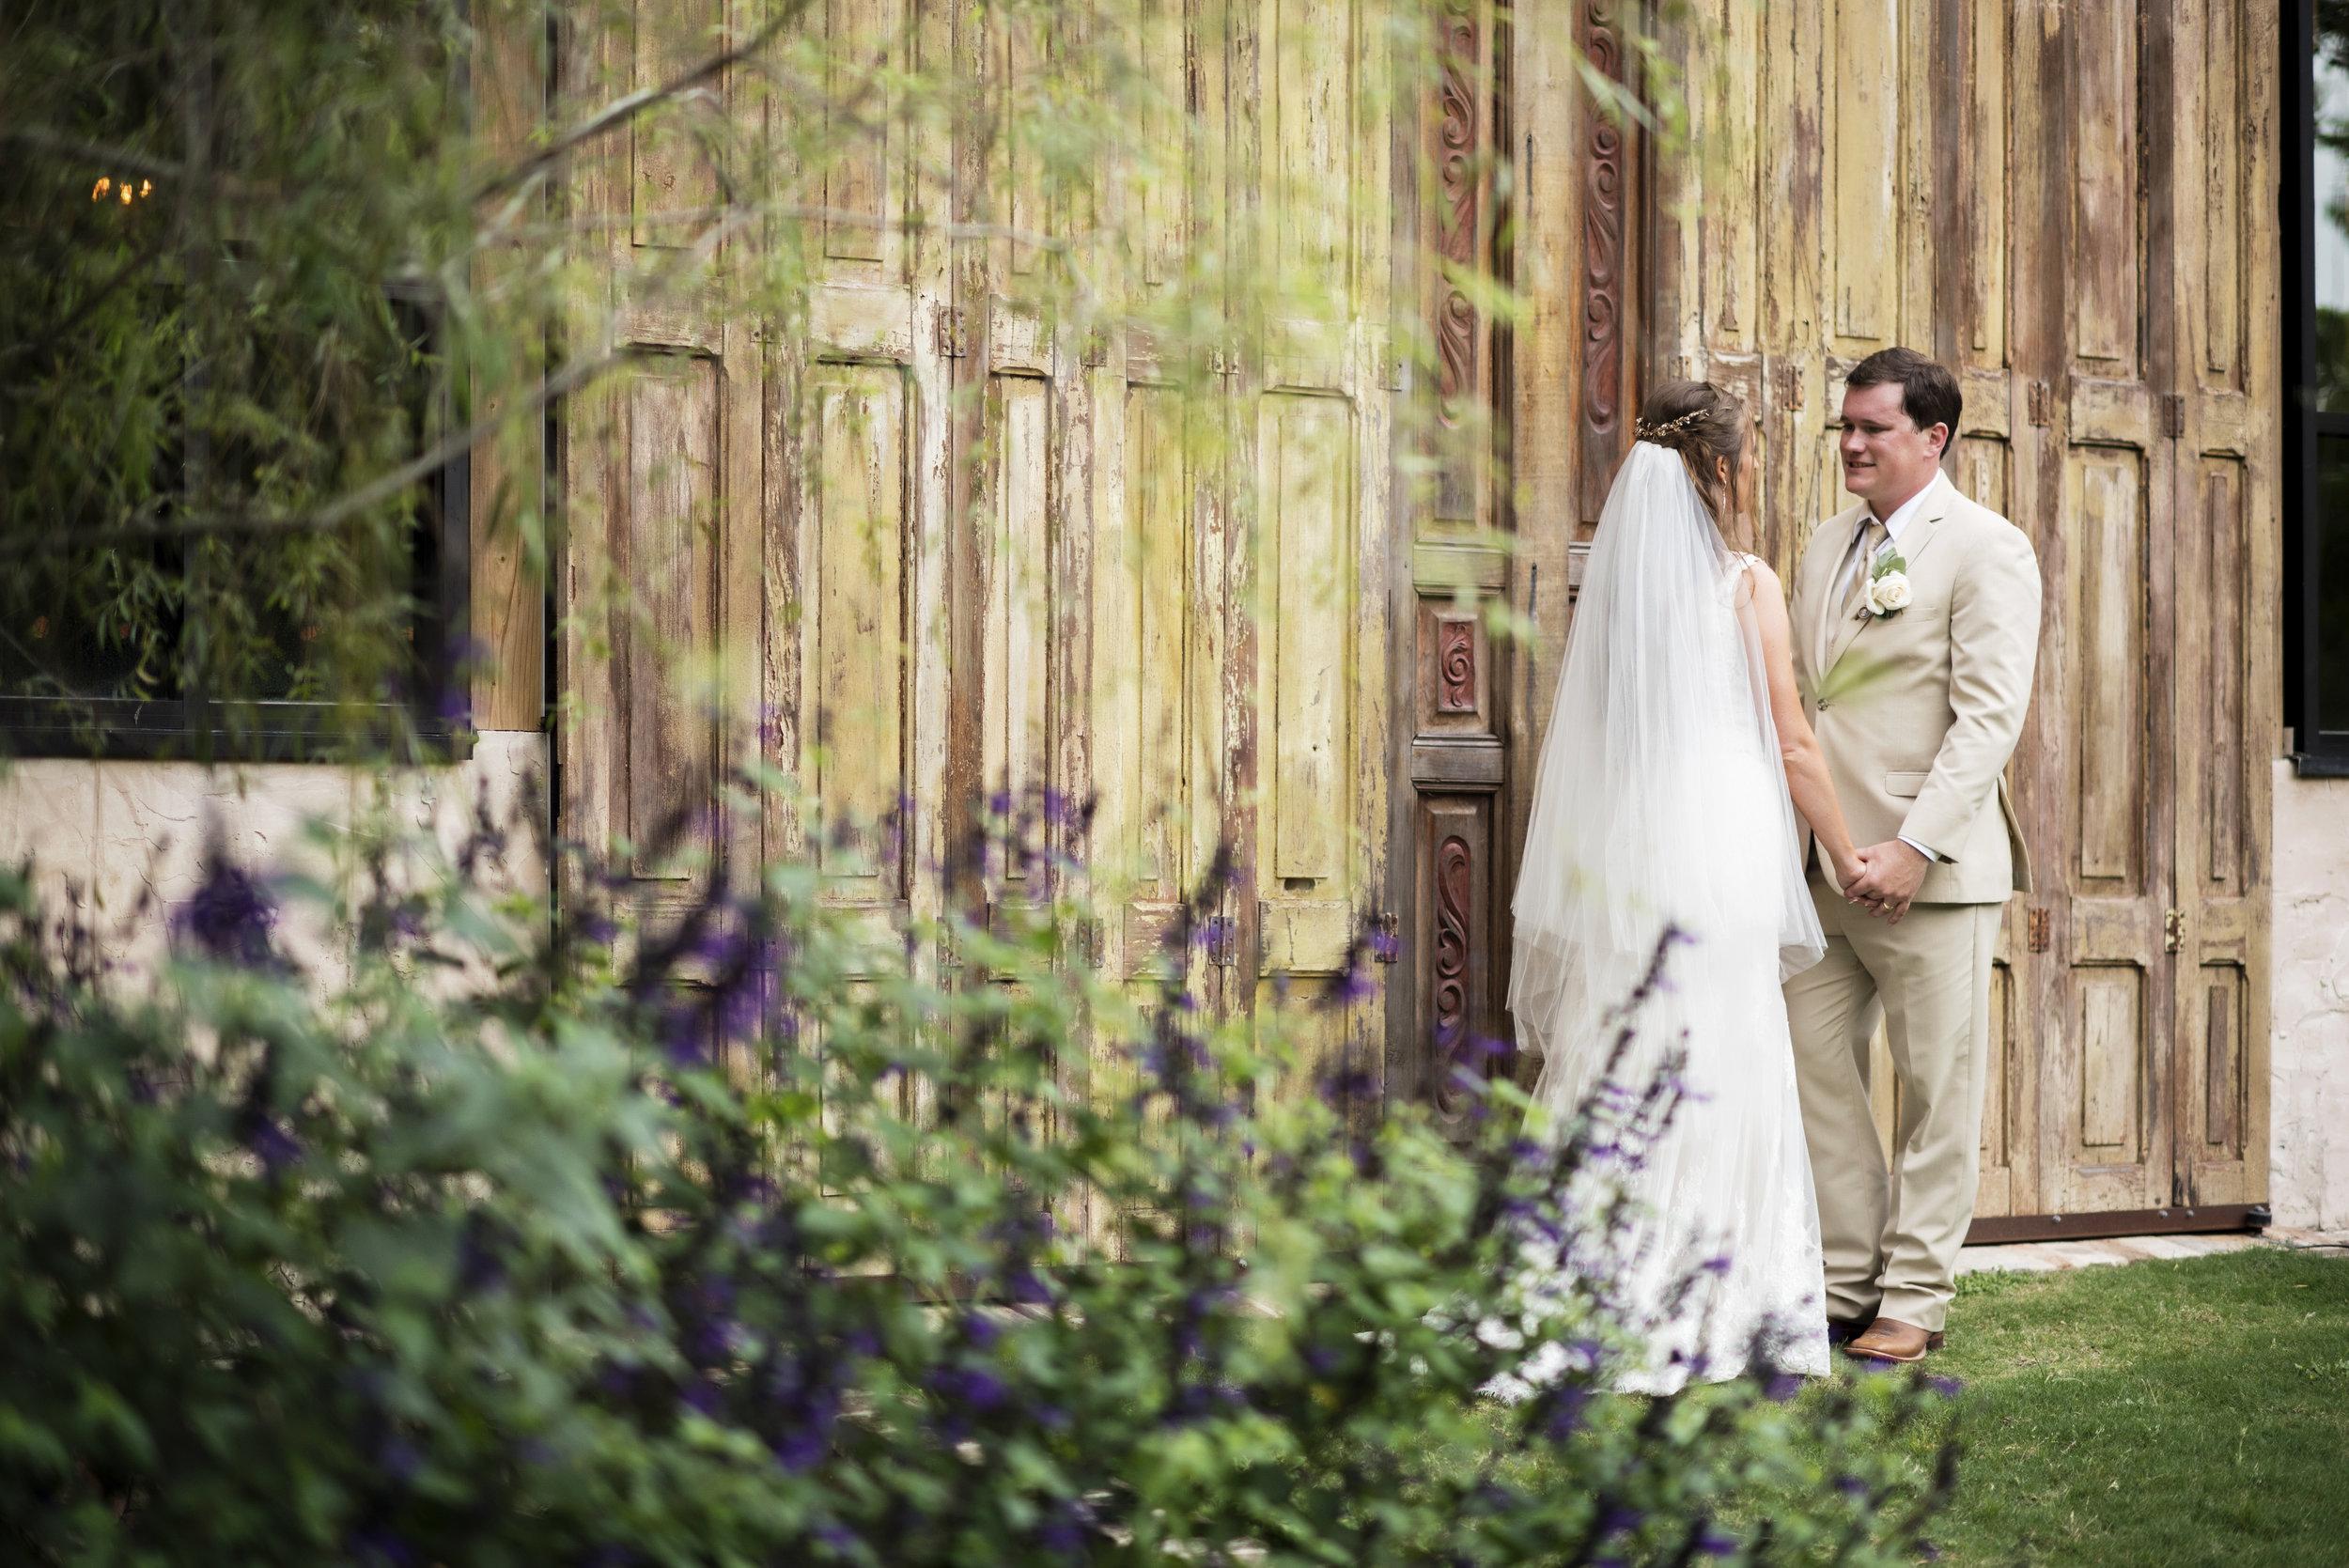 Calvin-wedding-chandelier-grove-tomball-tx-ashleigh-rodriguez-photography (199 of 199).jpg